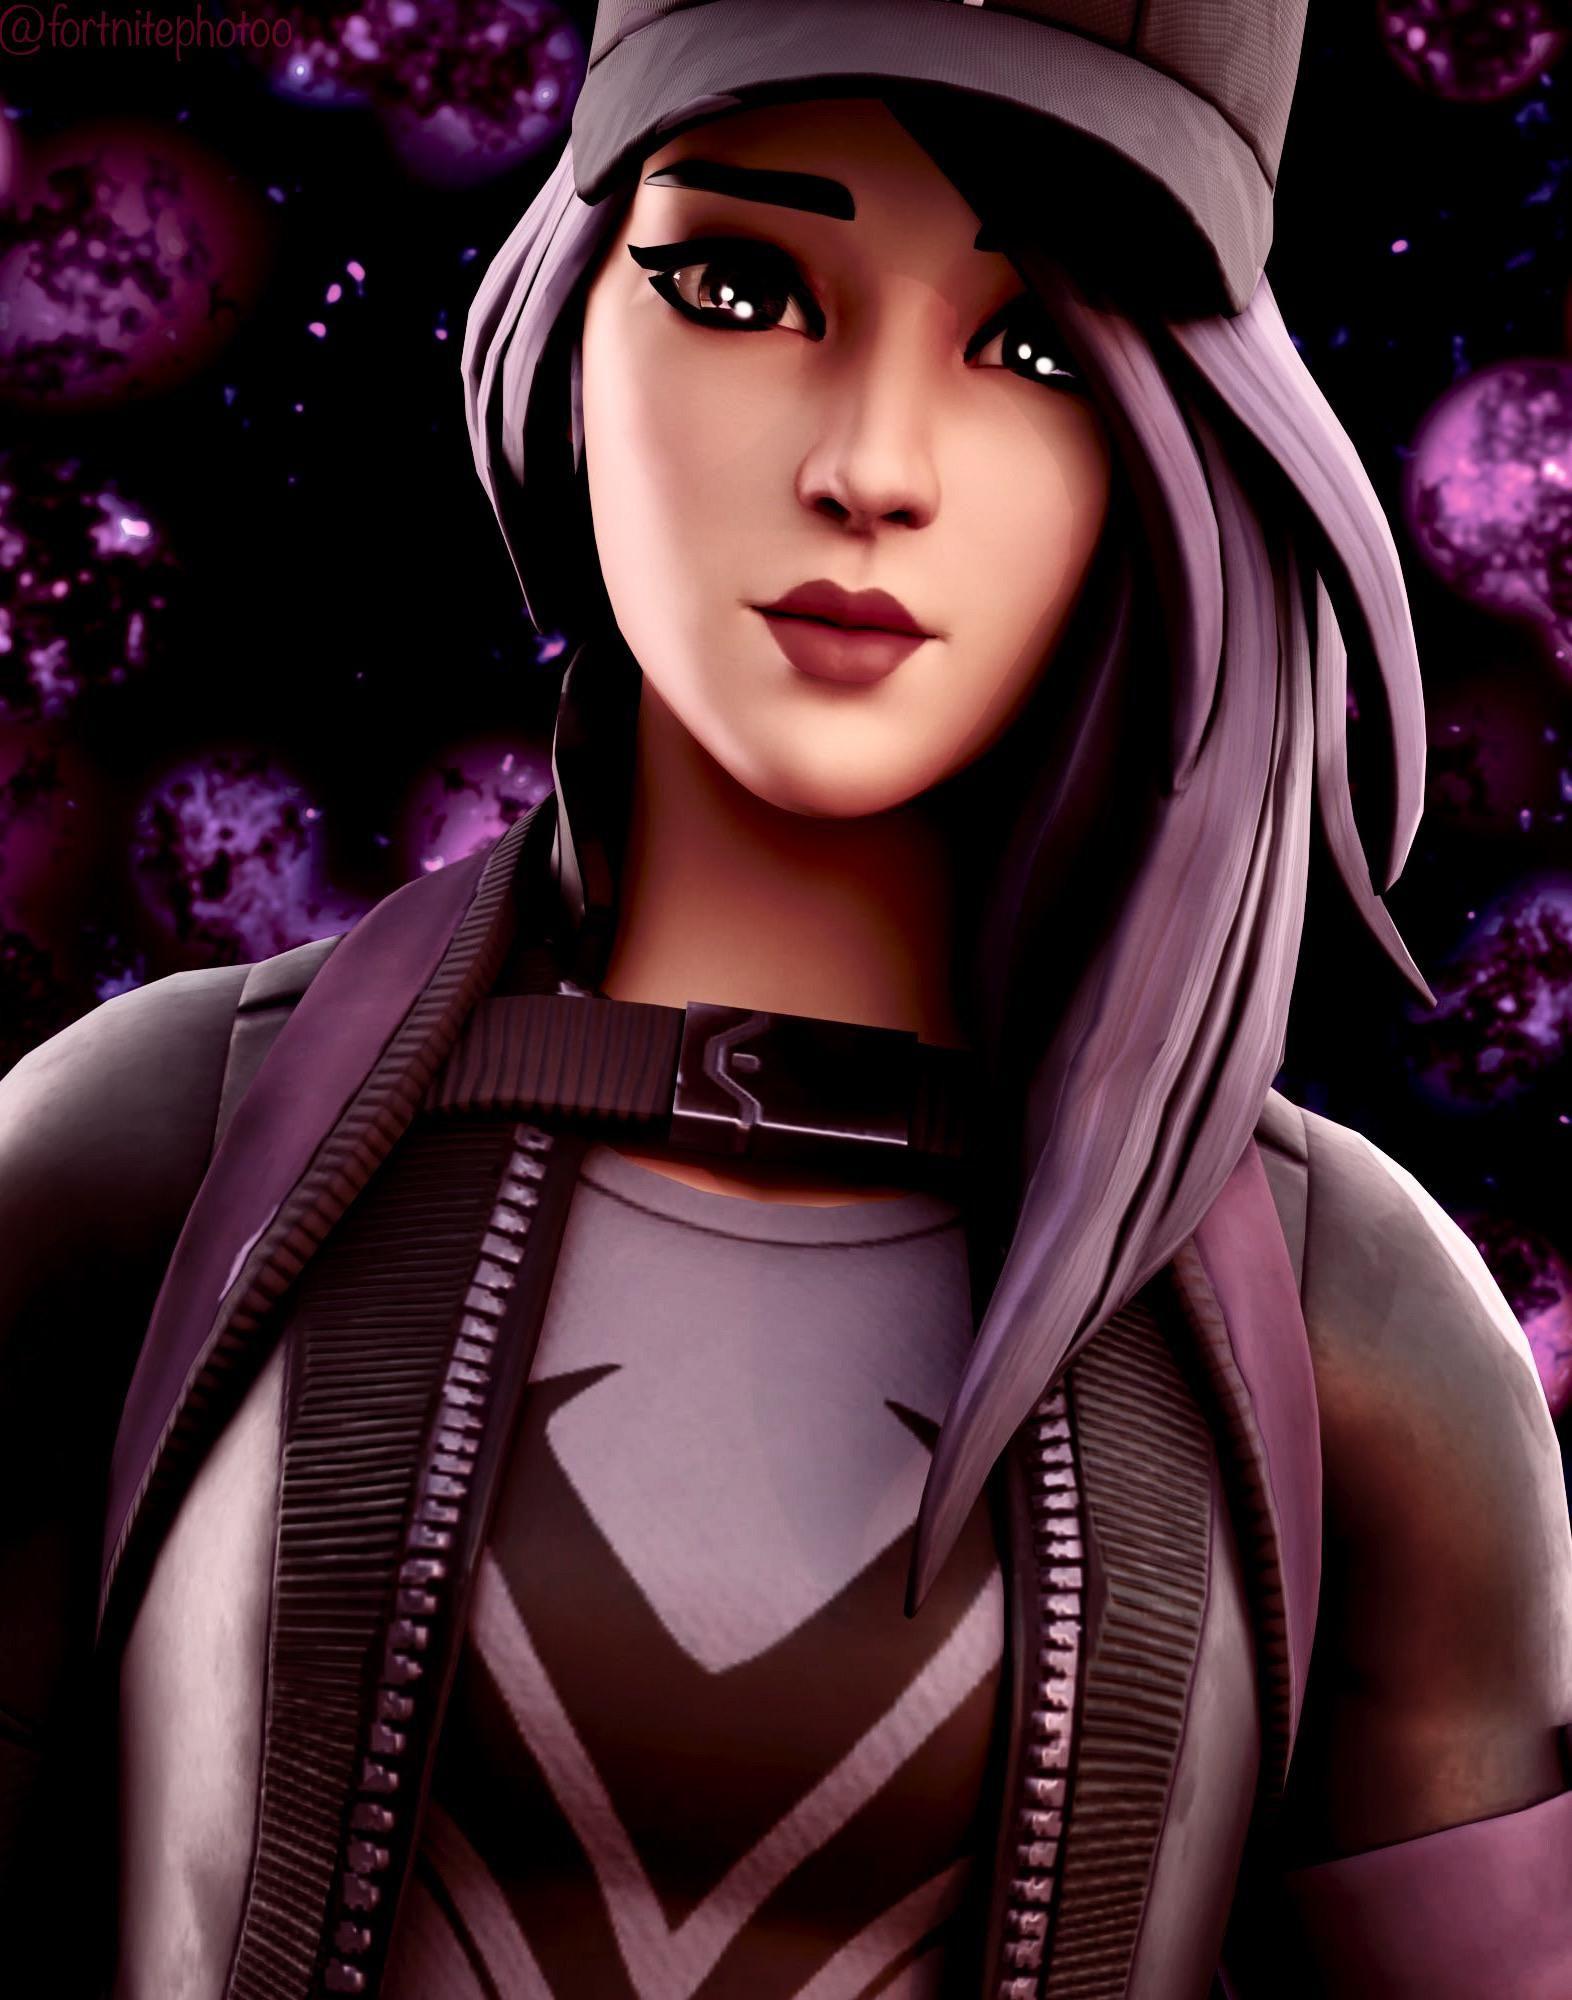 Fortnite Art Fanart Best Gaming Wallpapers Cute Art Styles Video Games Girls